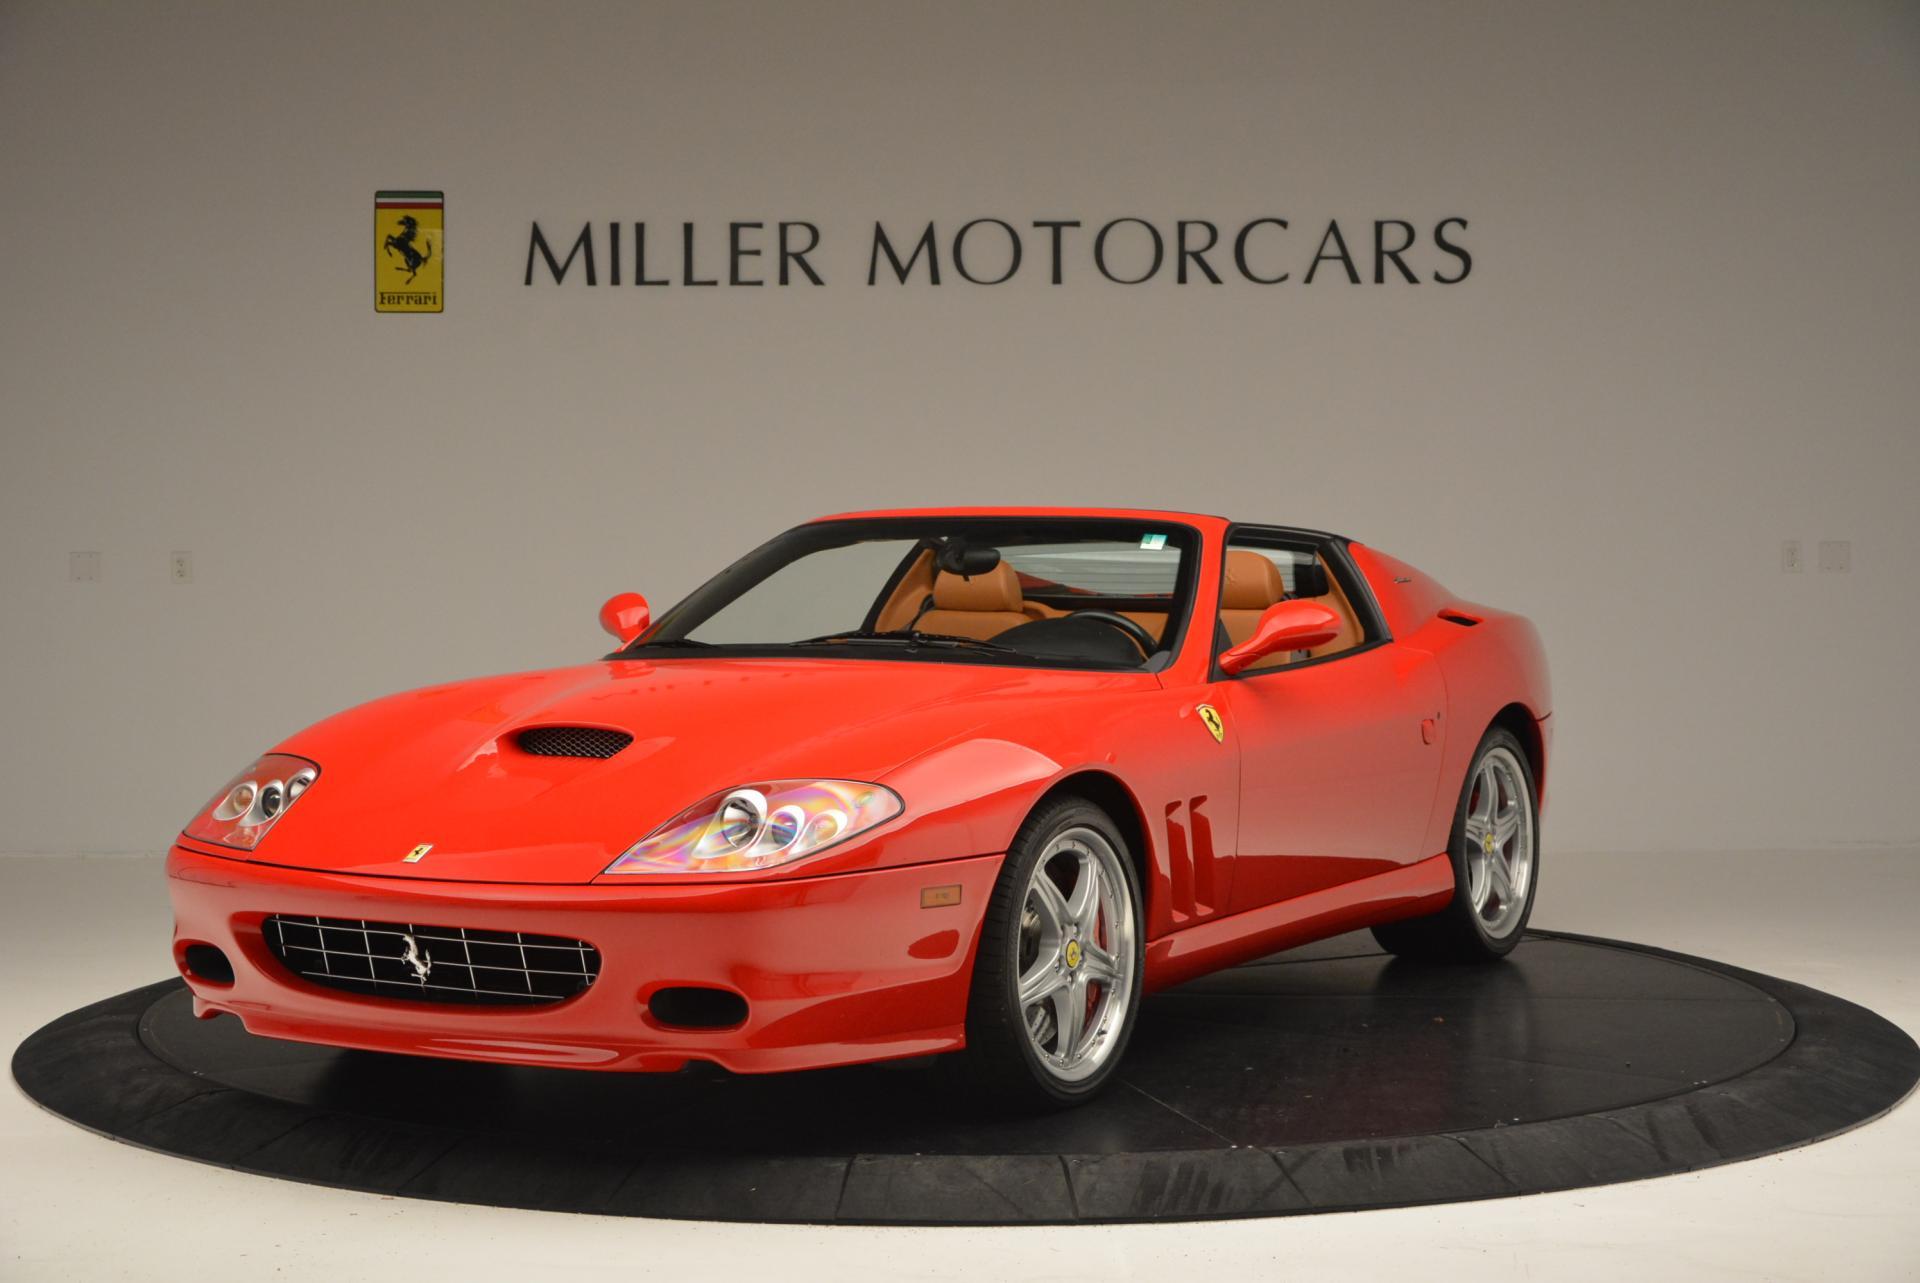 Used 2005 Ferrari Superamerica for sale Sold at Bentley Greenwich in Greenwich CT 06830 1